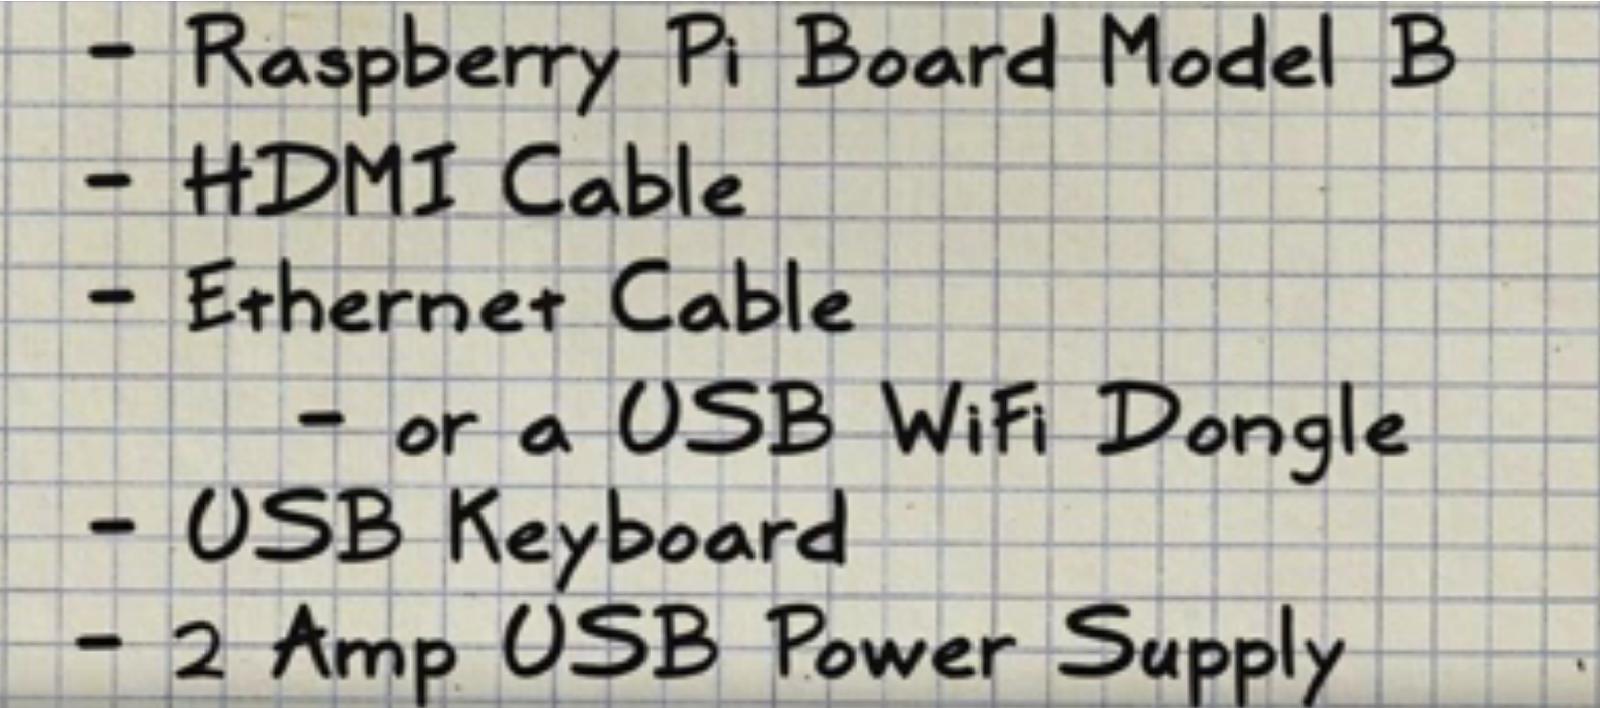 Alegra Broadband: Netflix on your Raspberry Pi - DiY